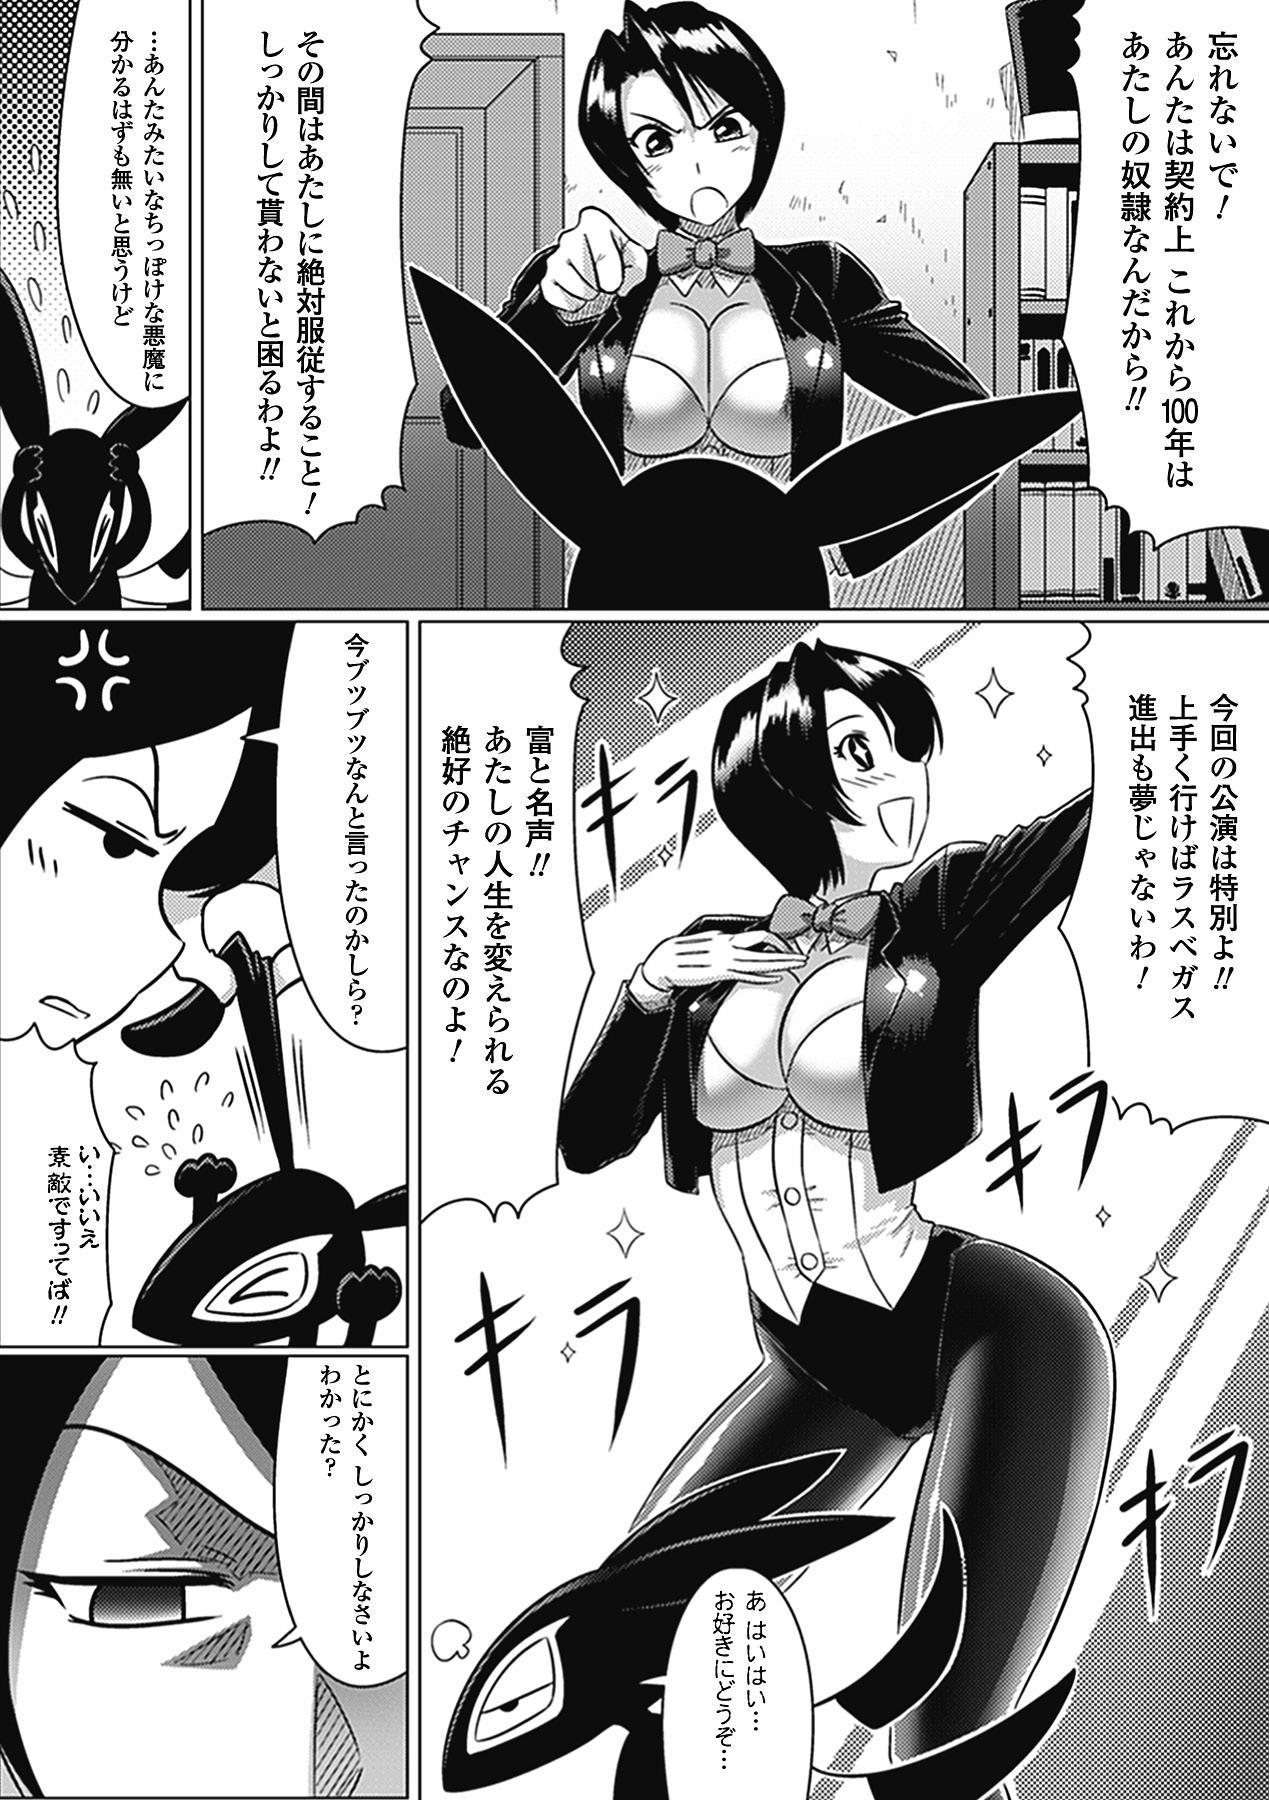 Megami Crisis 1 142